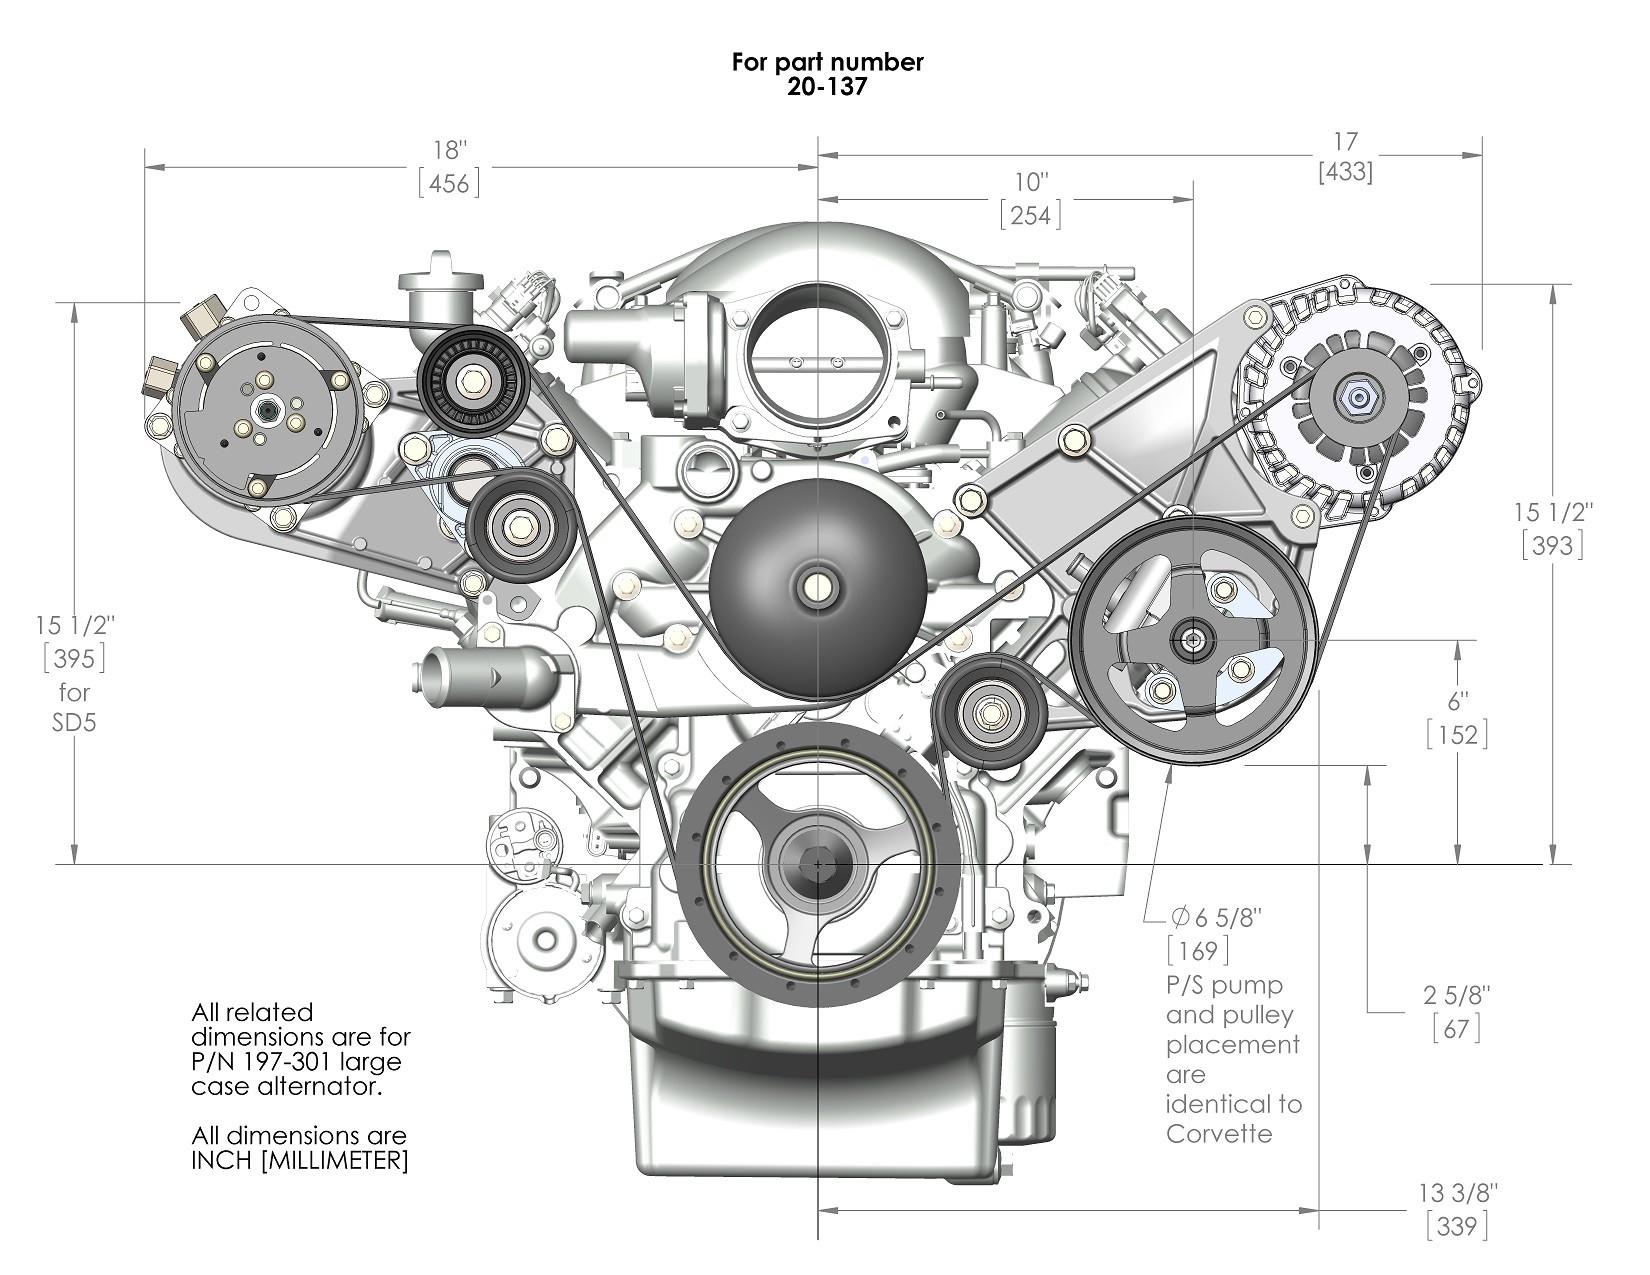 Car engine block diagram engine block blueprints google search my car engine block diagram 20 137 dimensions1 16501275 ls engines pinterest of car engine ccuart Gallery